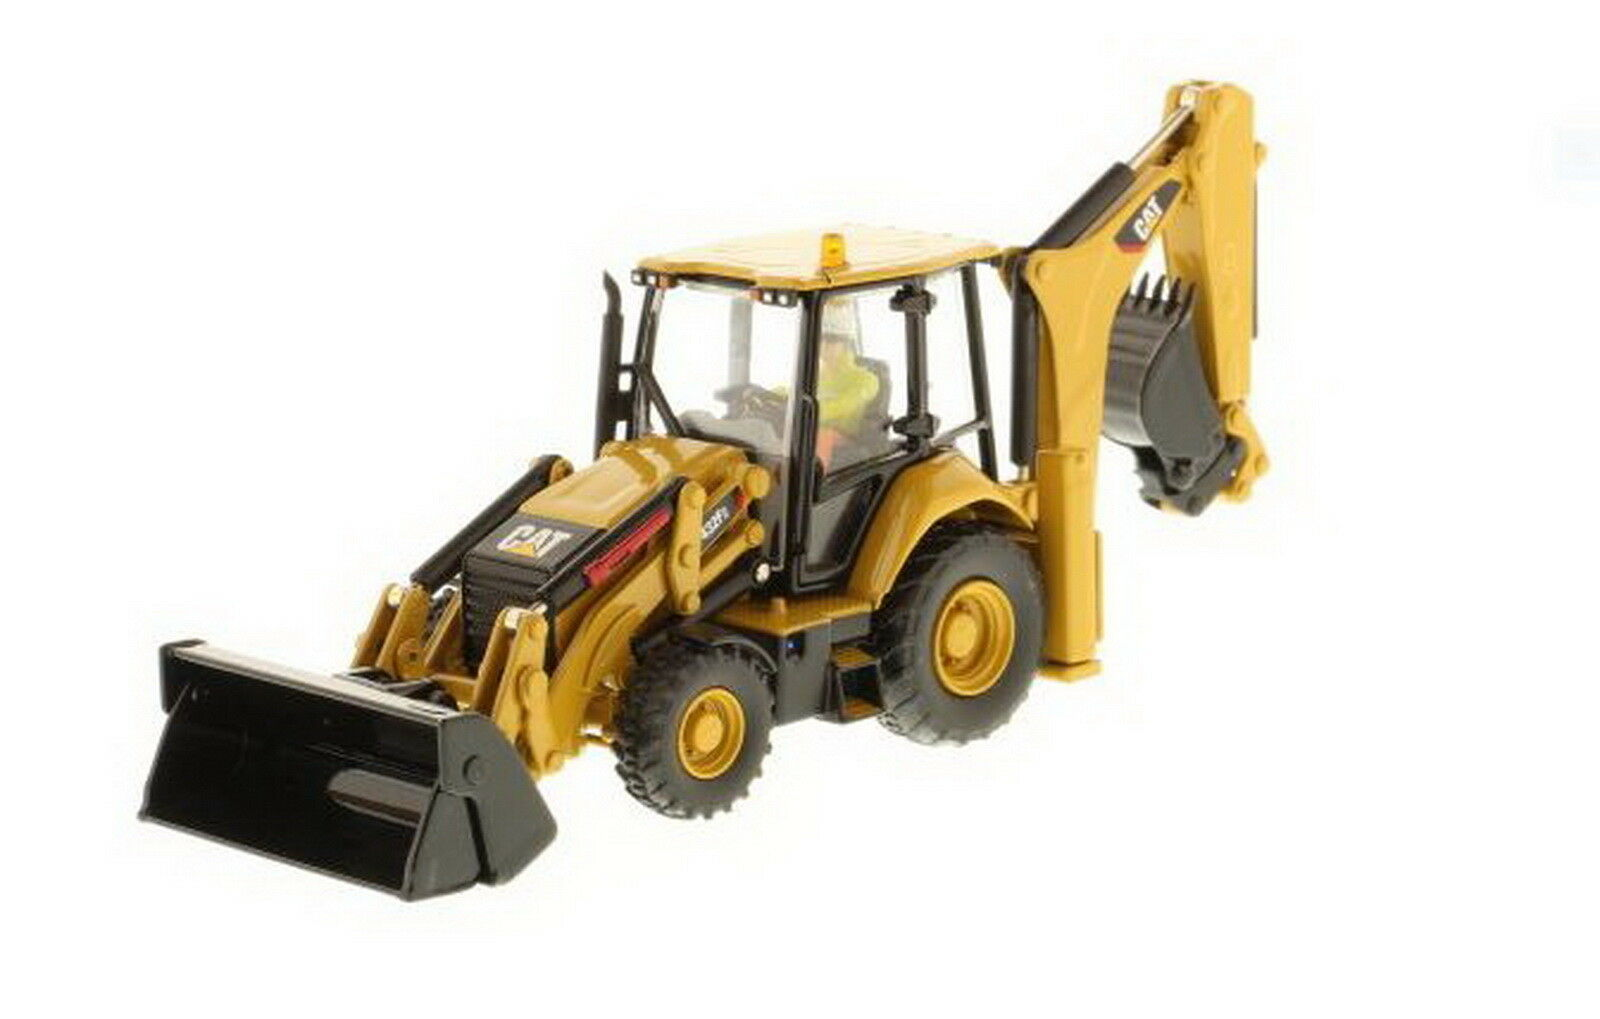 ordenar ahora 1 50 DM Caterpillar Cat 432F2 432F2 432F2 Side Shift Backhoe Loader Diecast Model  85249  artículos de promoción